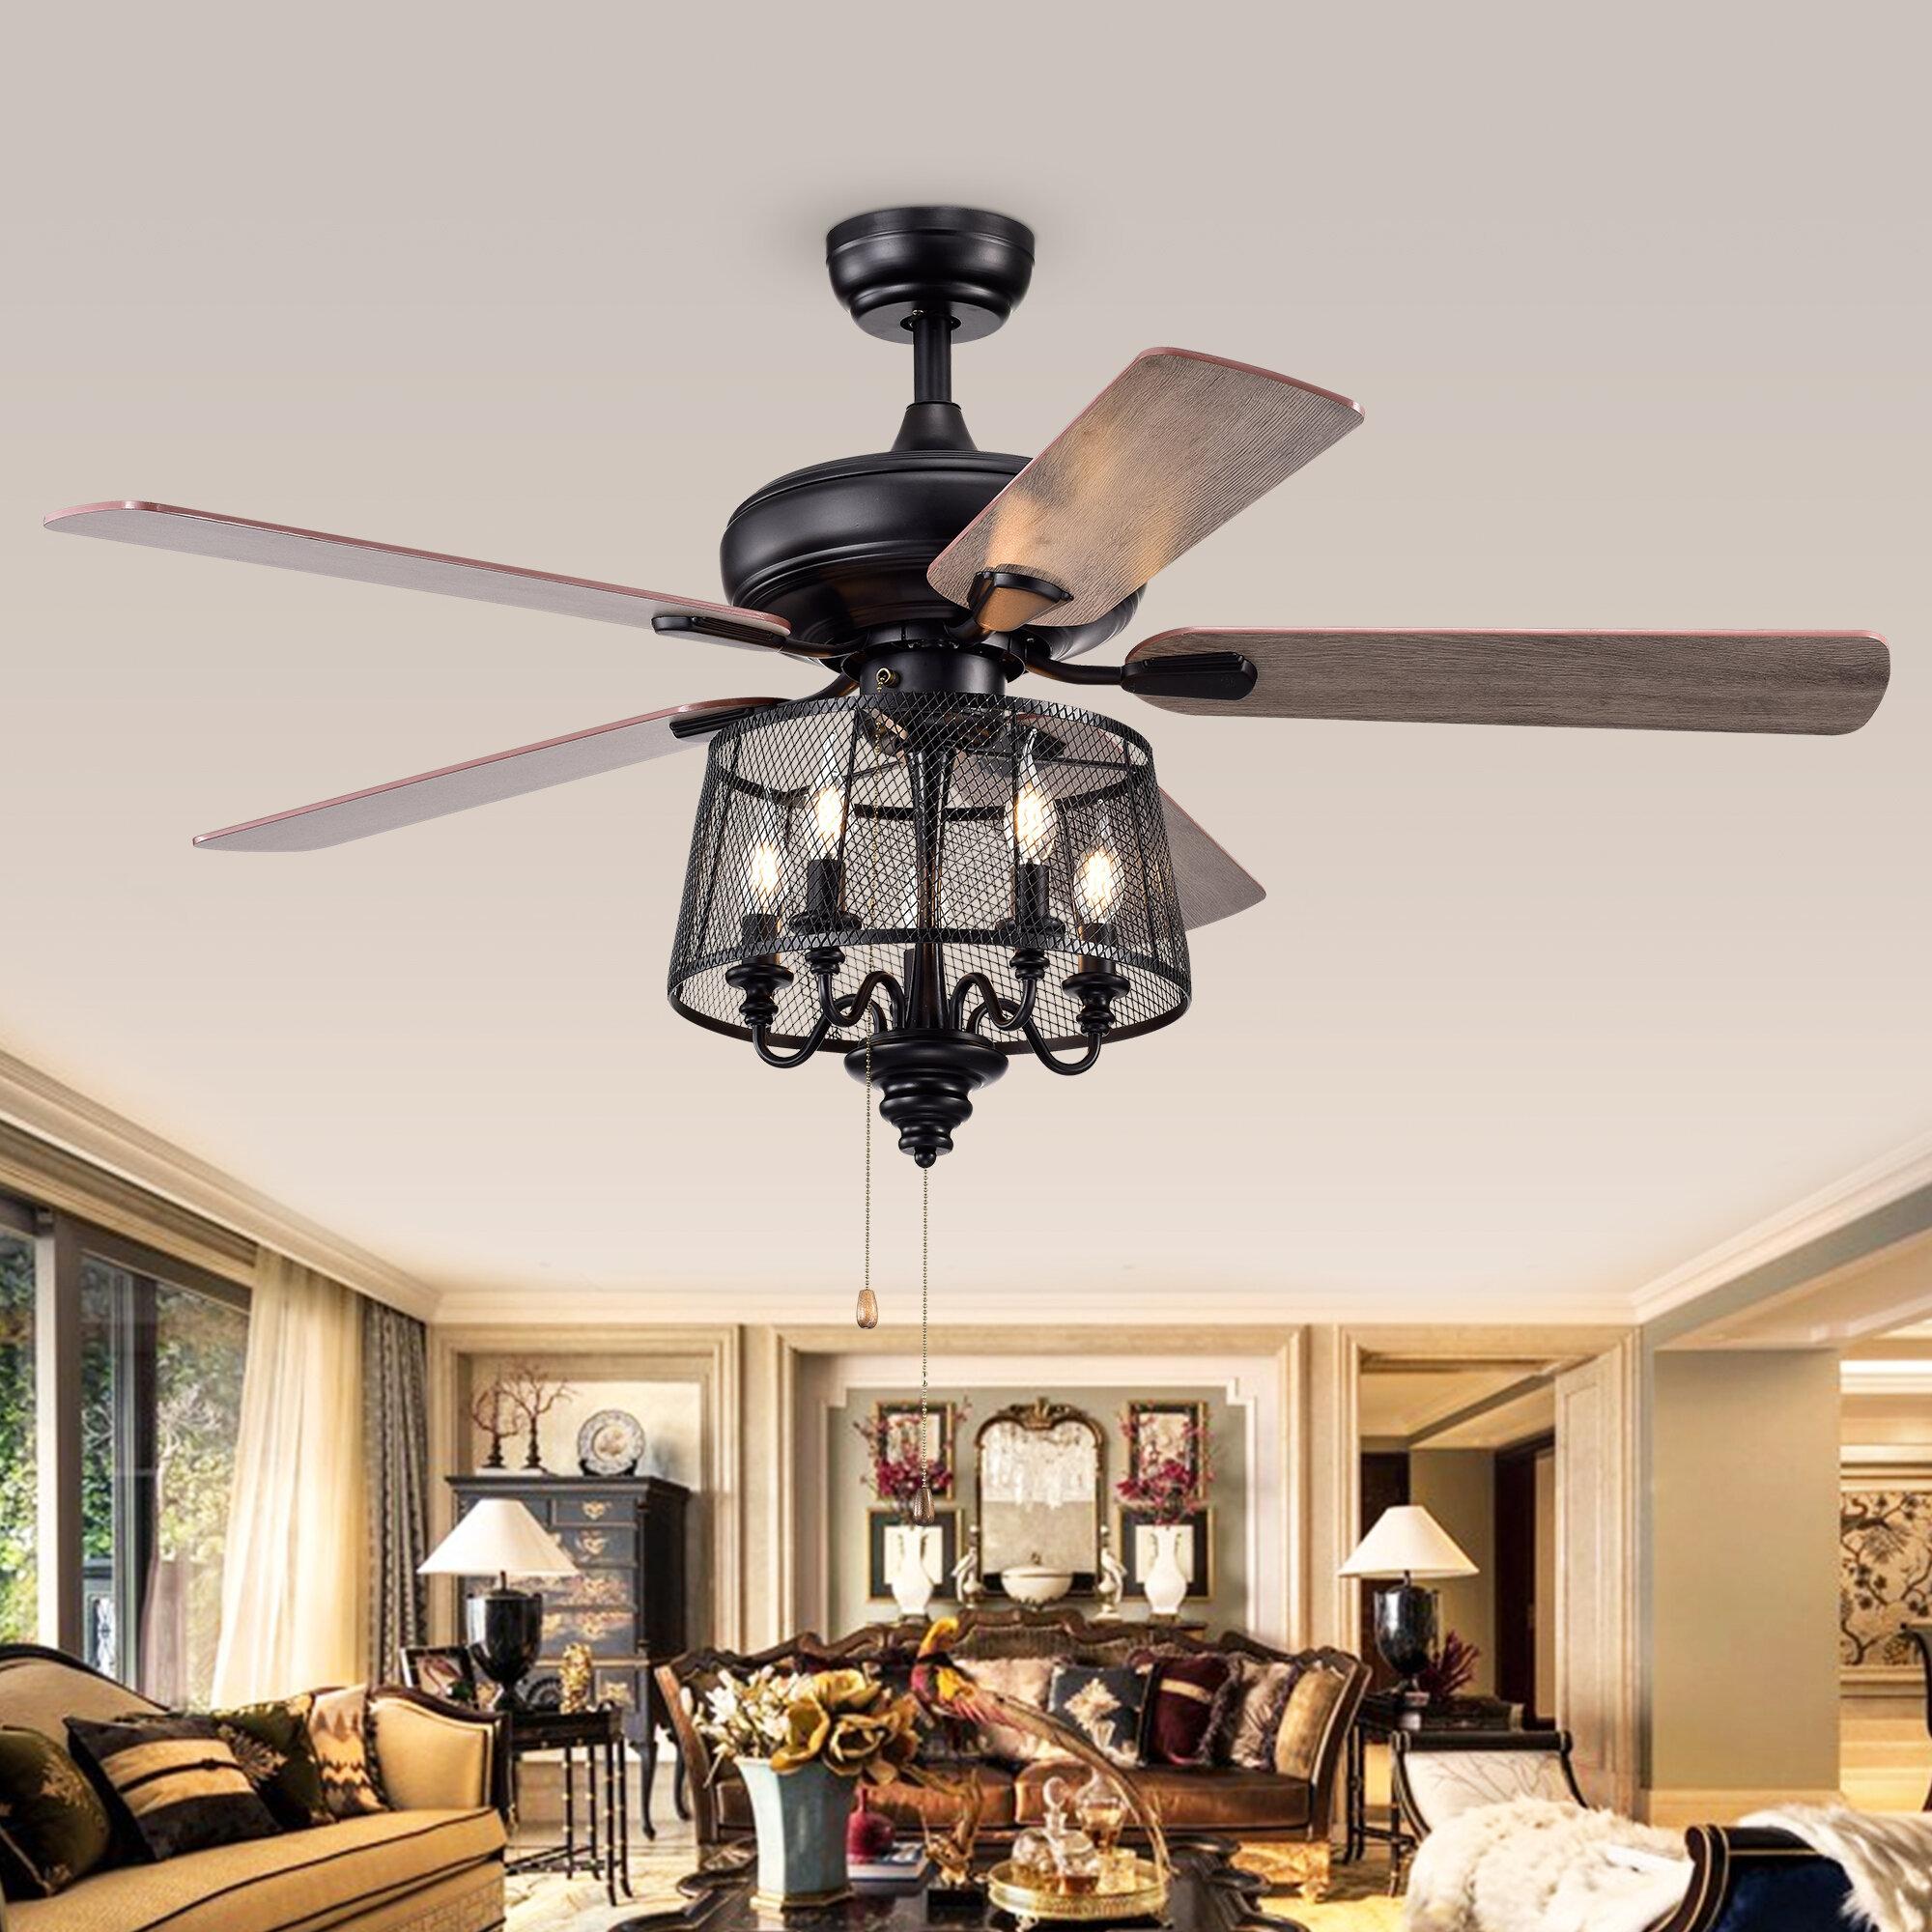 Gracie Oaks Croteau 5 Blade Ceiling Fan